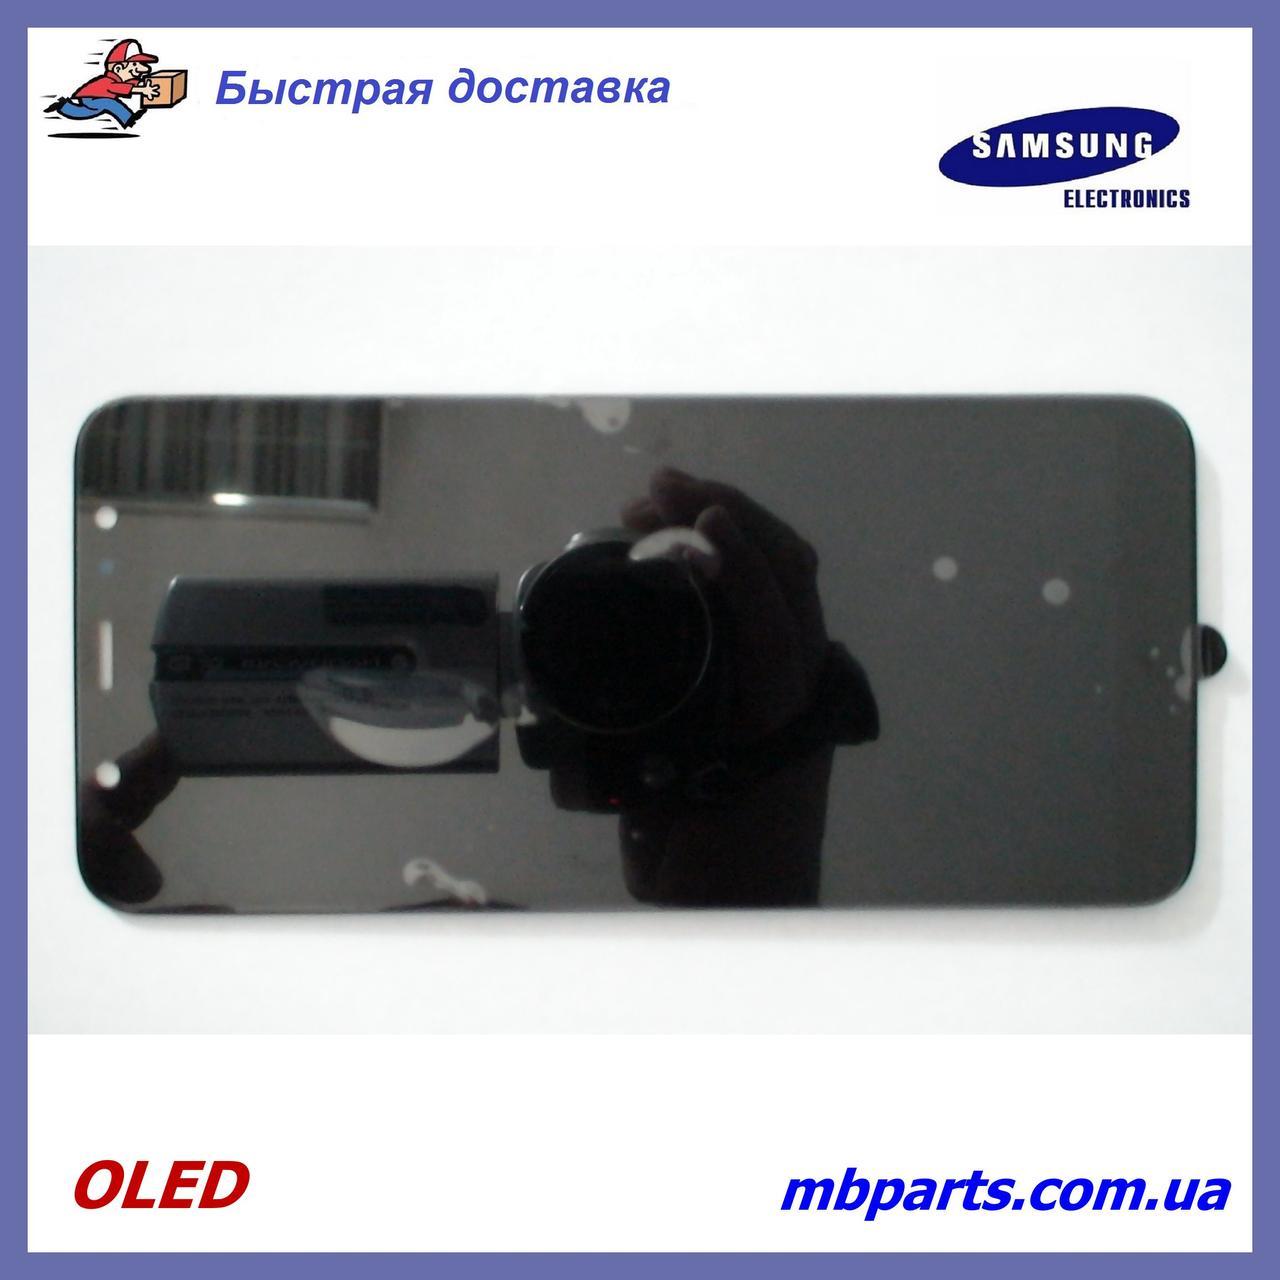 Дисплей с сенсором Samsung A605 Galaxy A6 plus 2018 OLED Black!